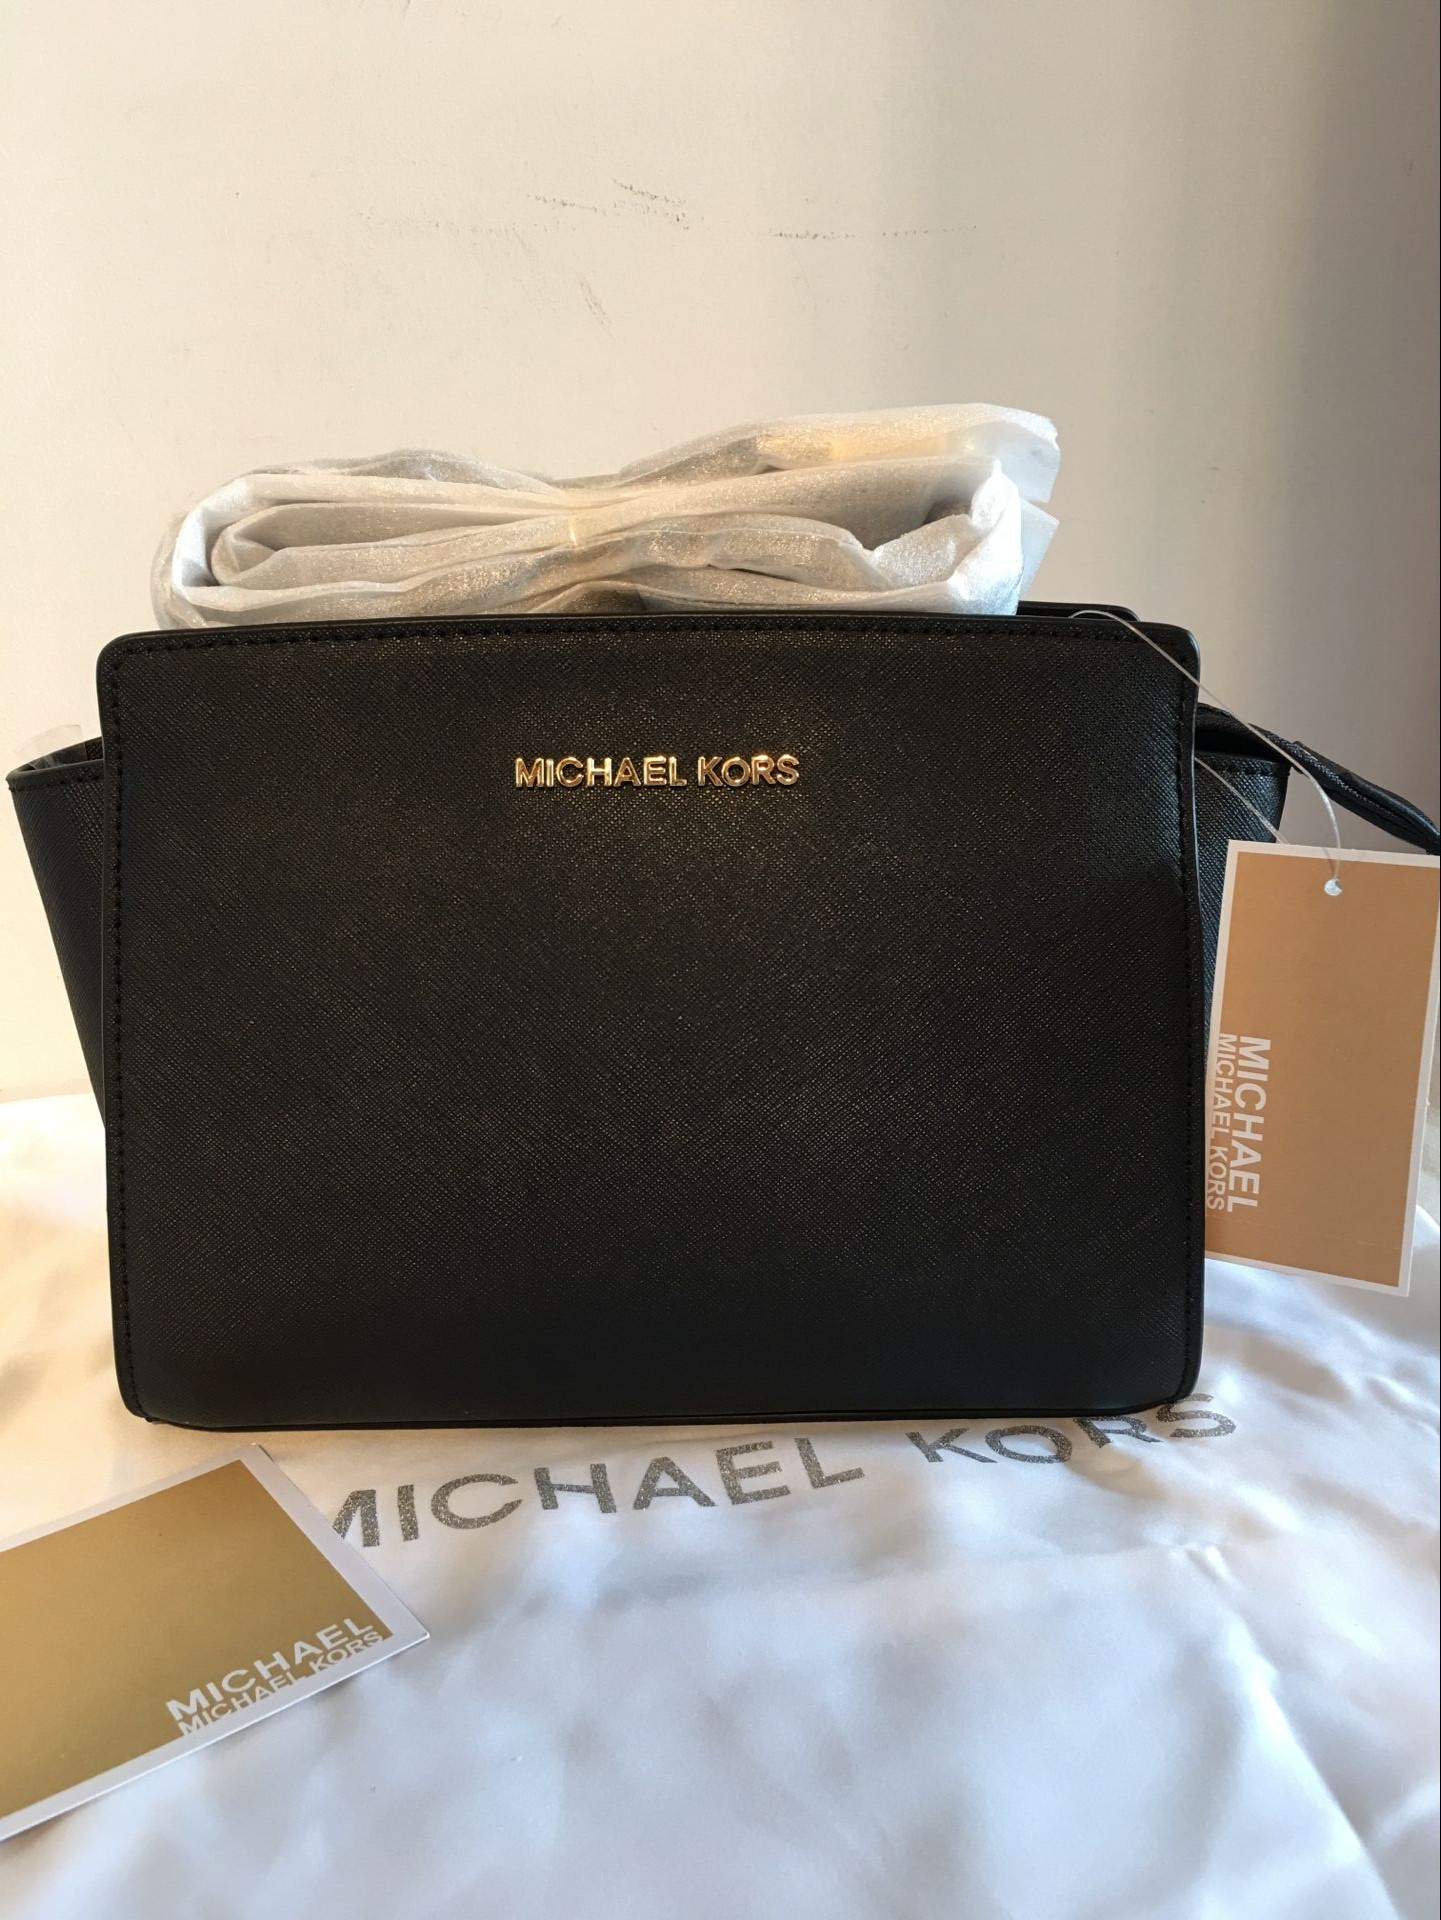 030267ad750e MICHAEL KORS Selma Medium Messenger Crossbody Bag Black Authentic on  Storenvy